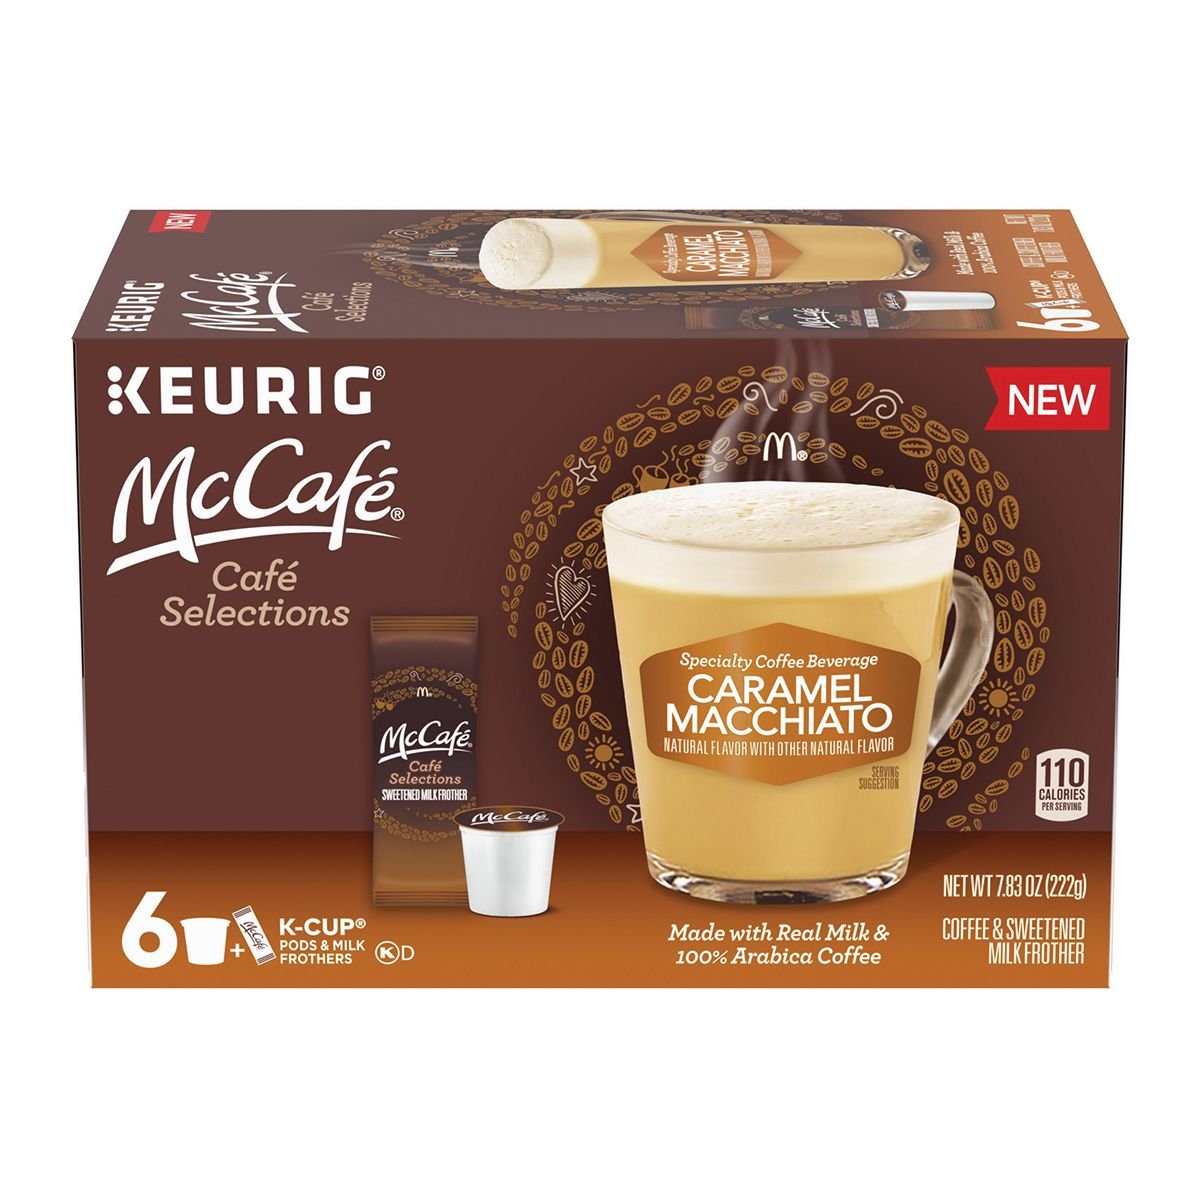 Box Of McCafé 2-Step K-Cups Caramel Macchiato